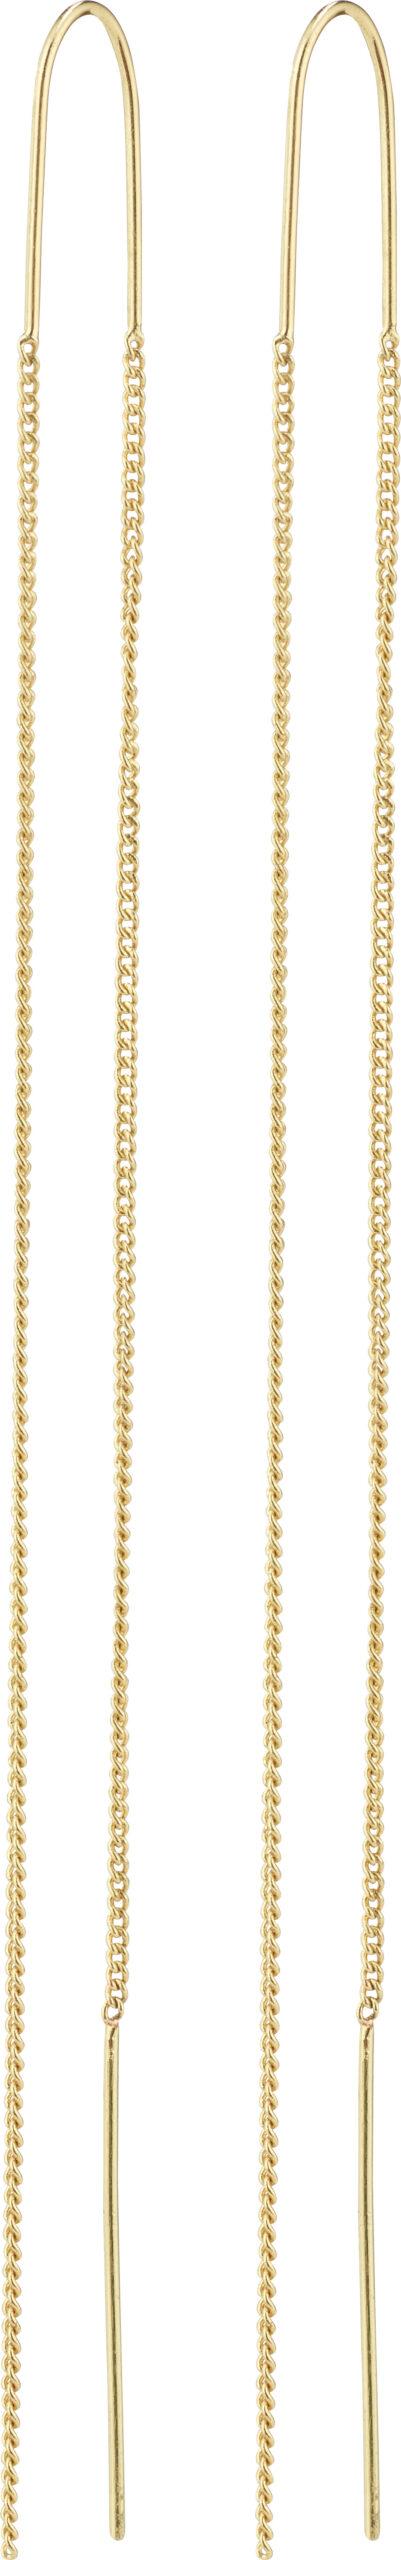 112122013 earrings gold plated karma pilgrim